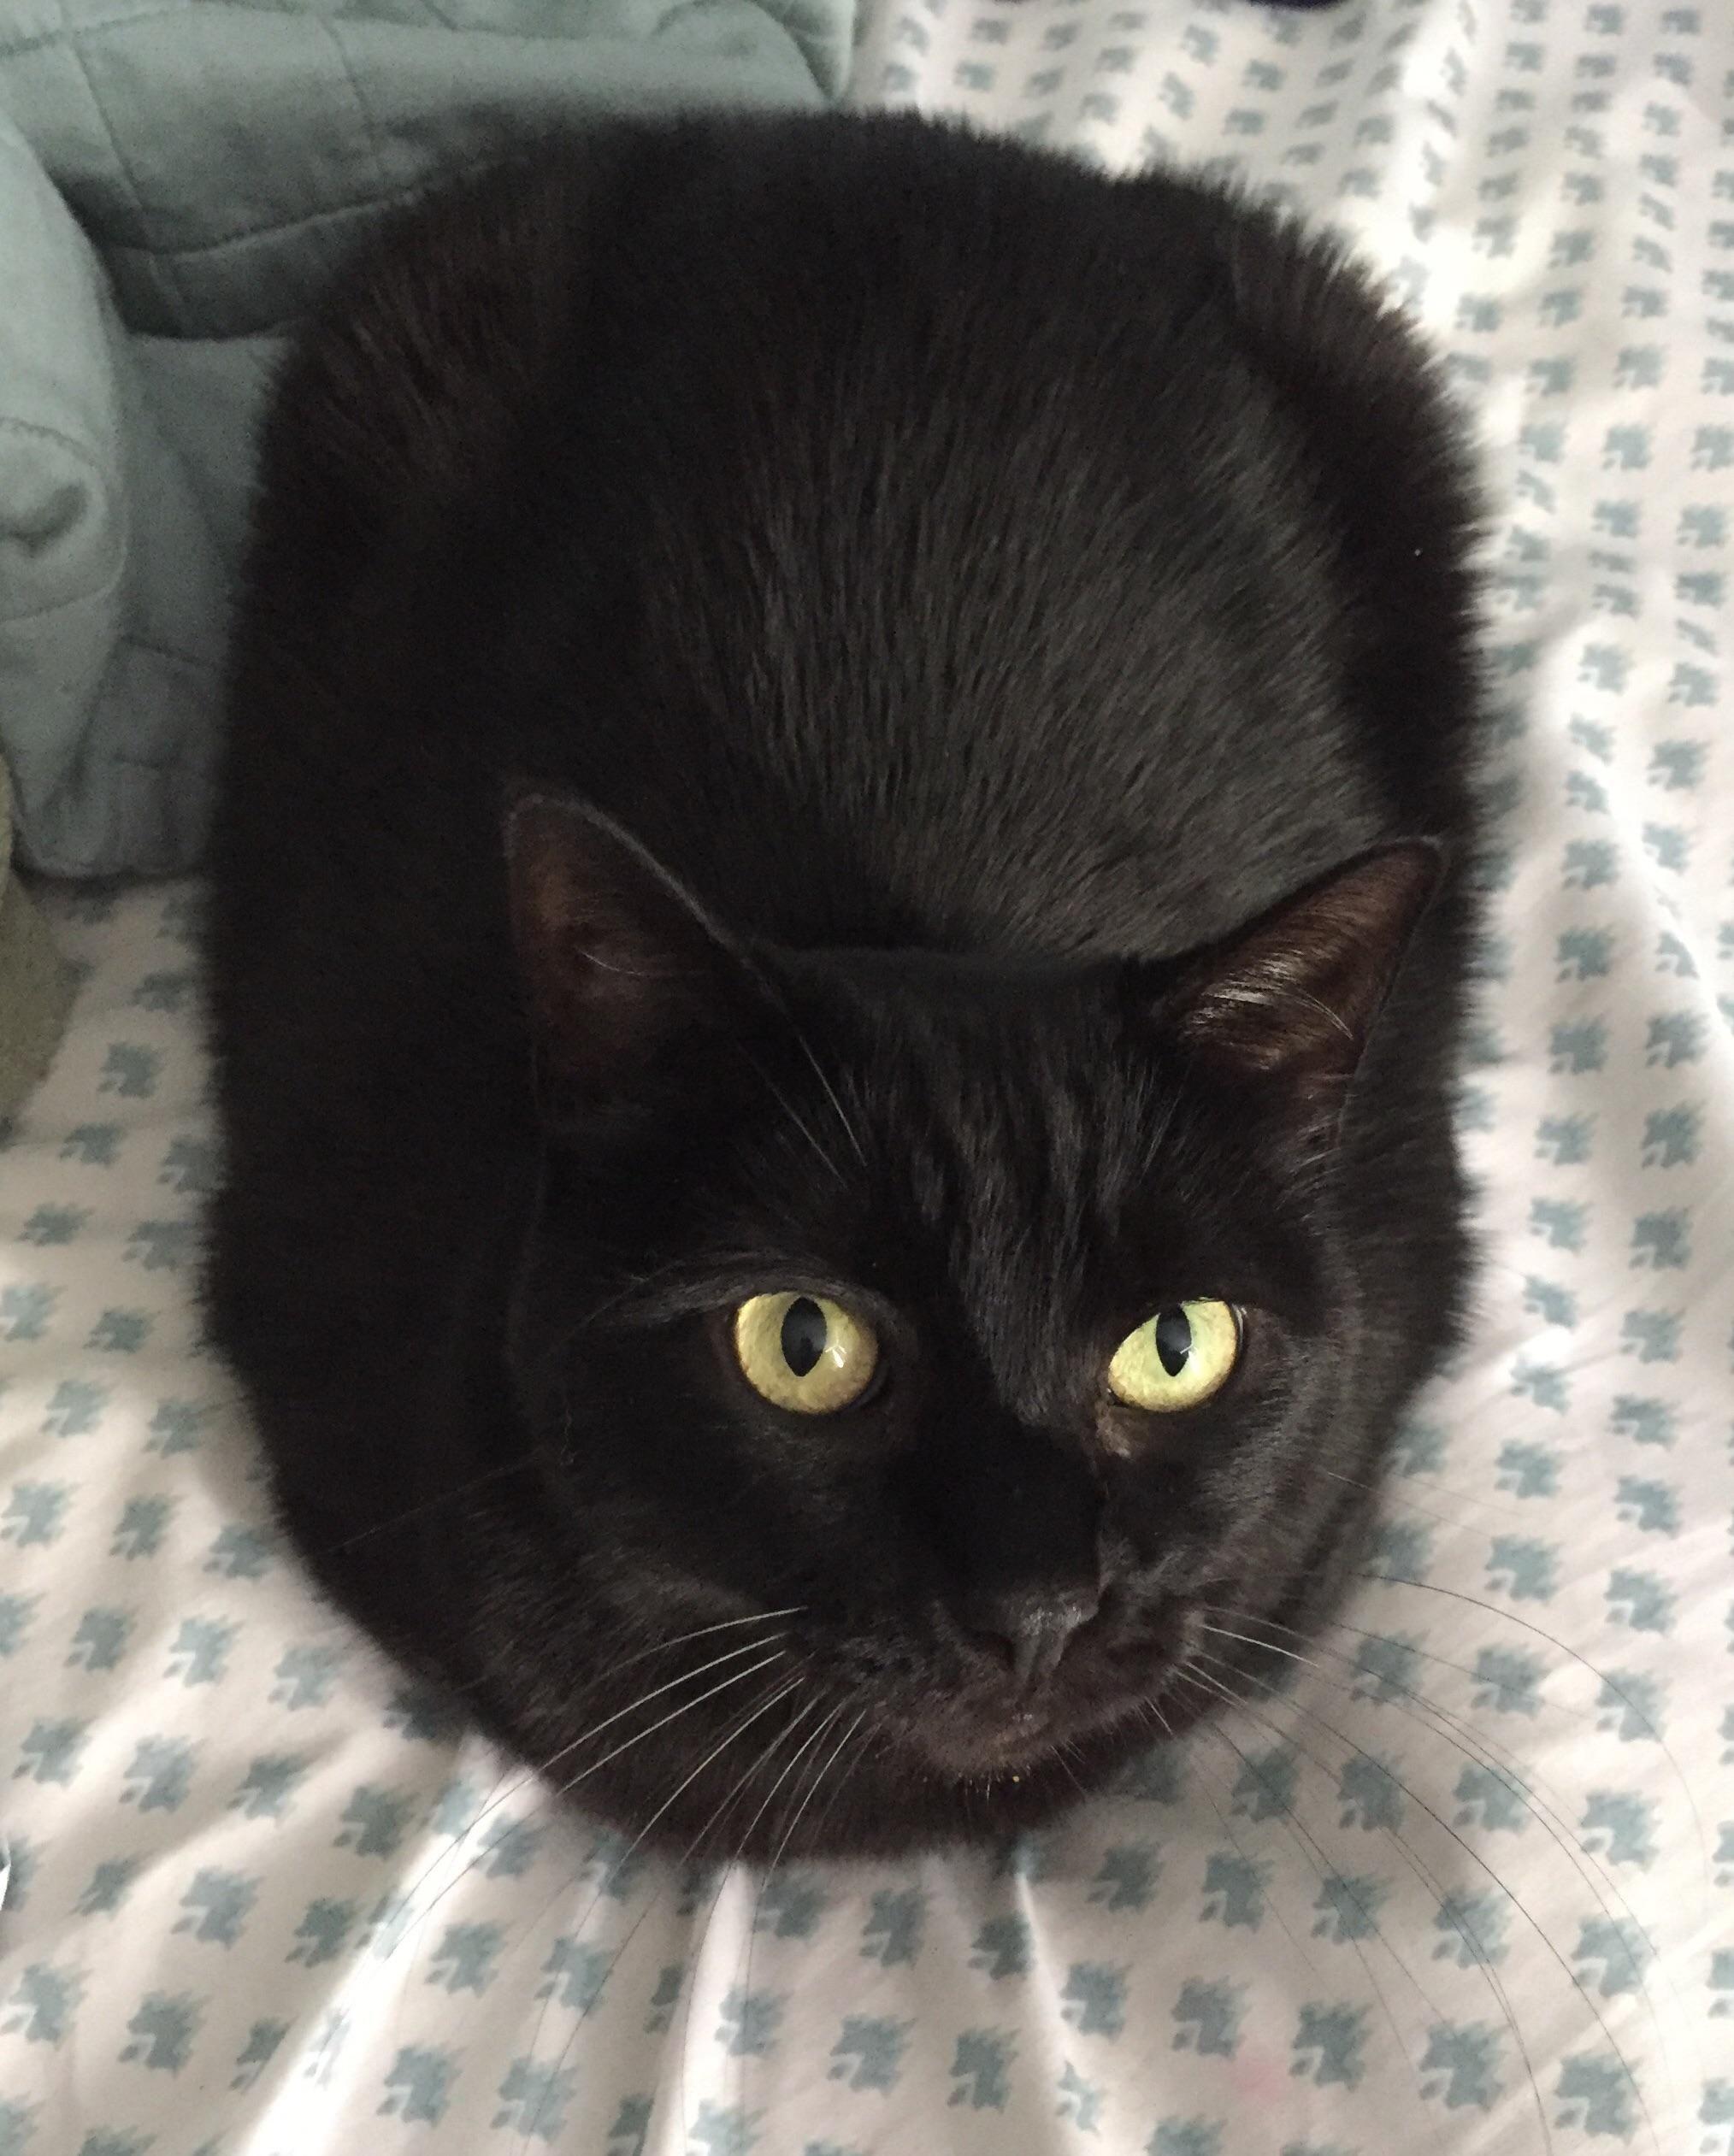 Russian Black Bread Loaf Meow Moe Cats Kittens Cutest Cute Cats